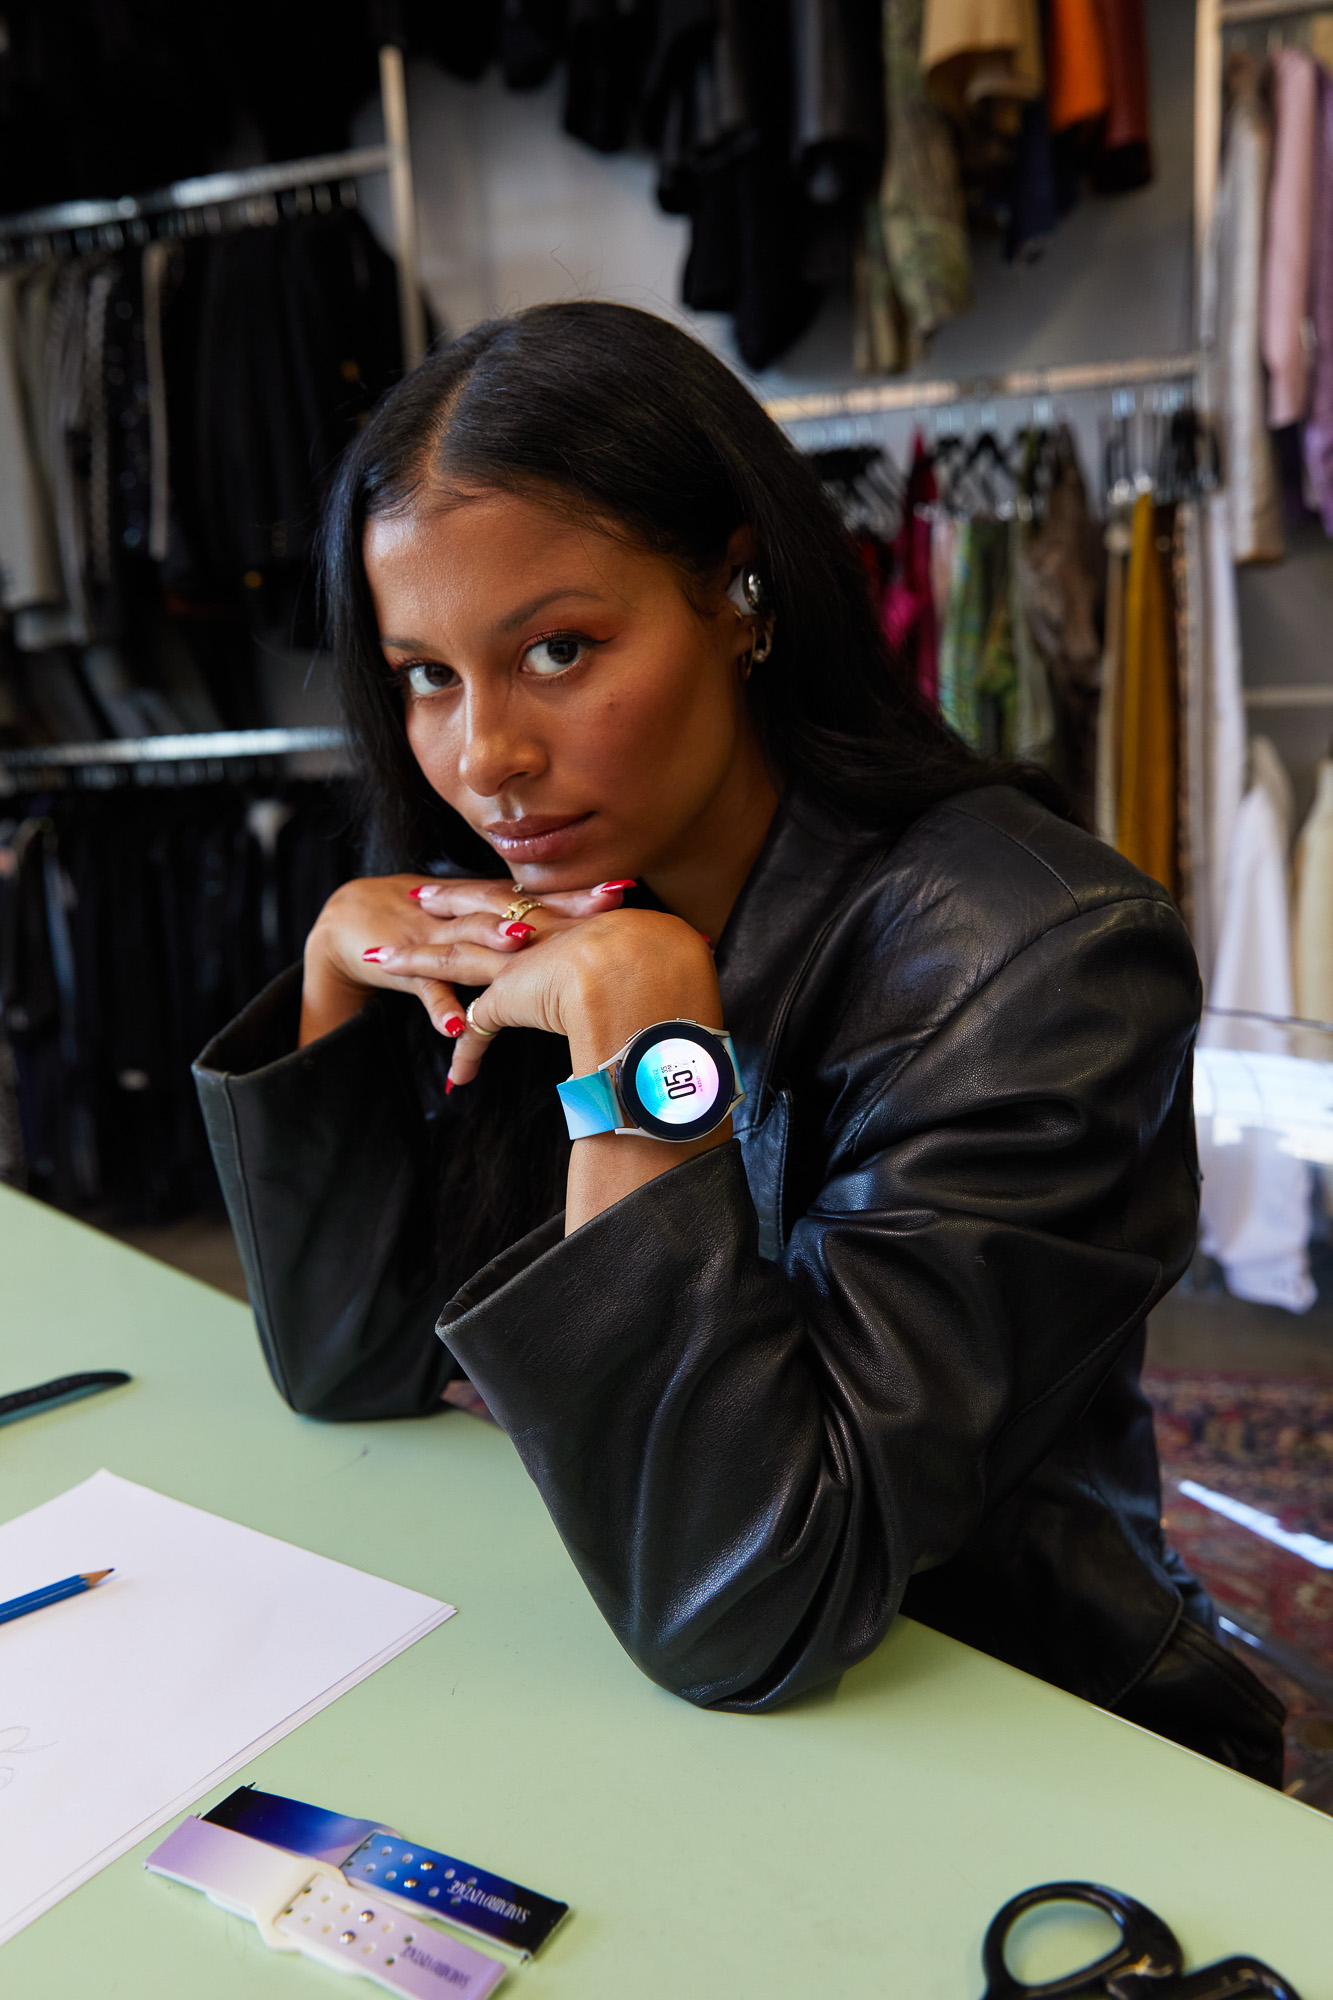 Samsung Galaxy Watch4 x Sami Miró Vintage sustainable watchband collection